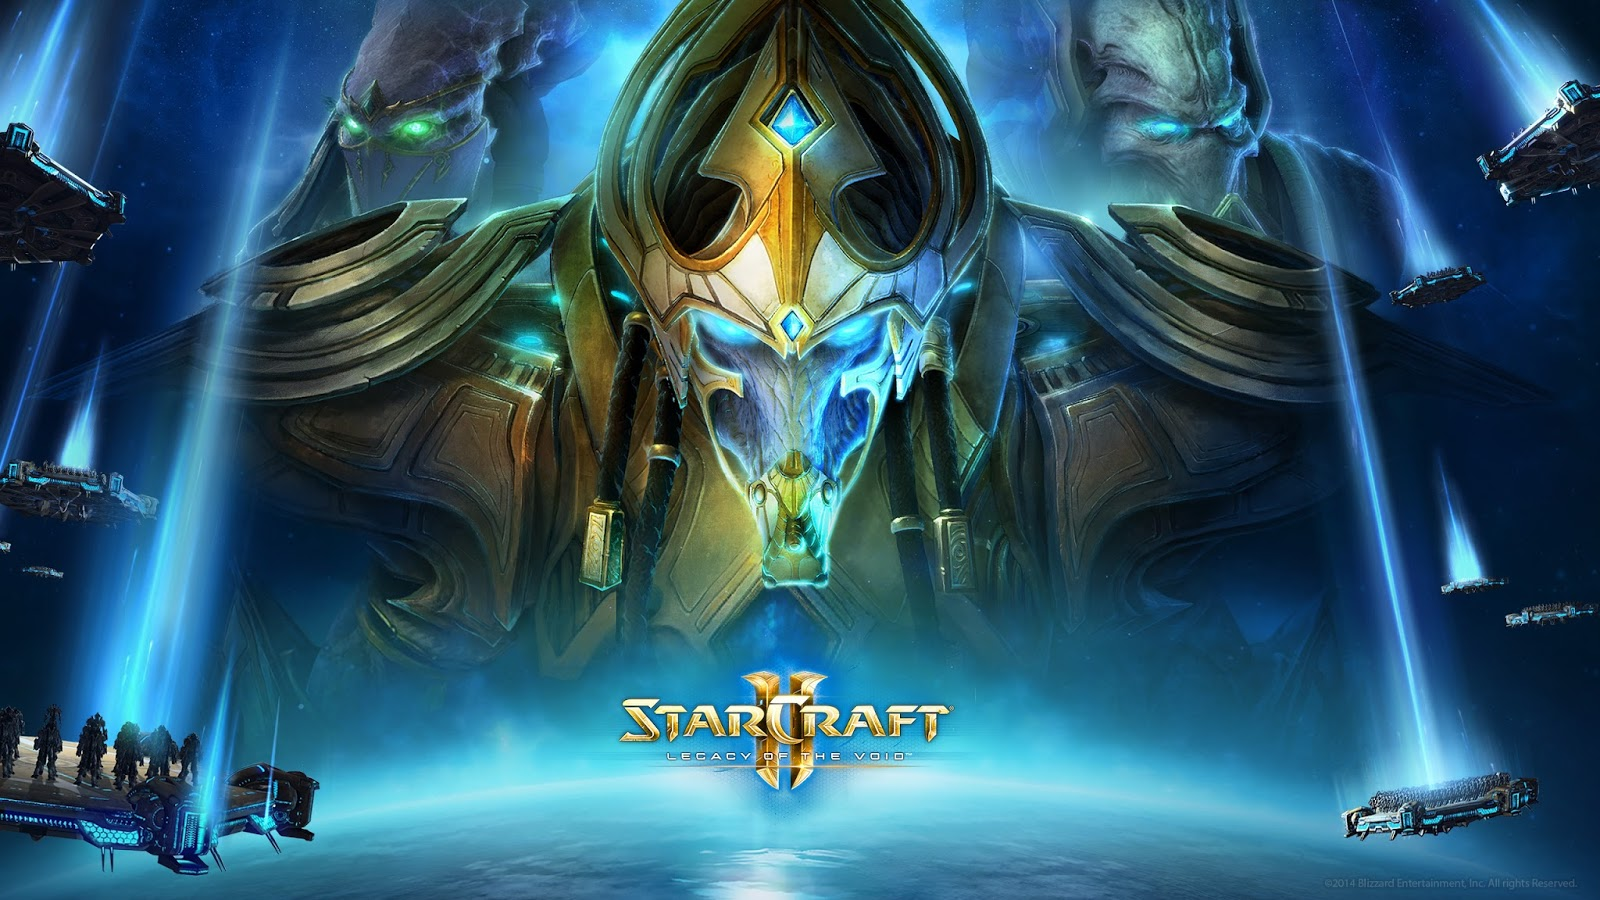 starcraft 2 matchmaking waiting